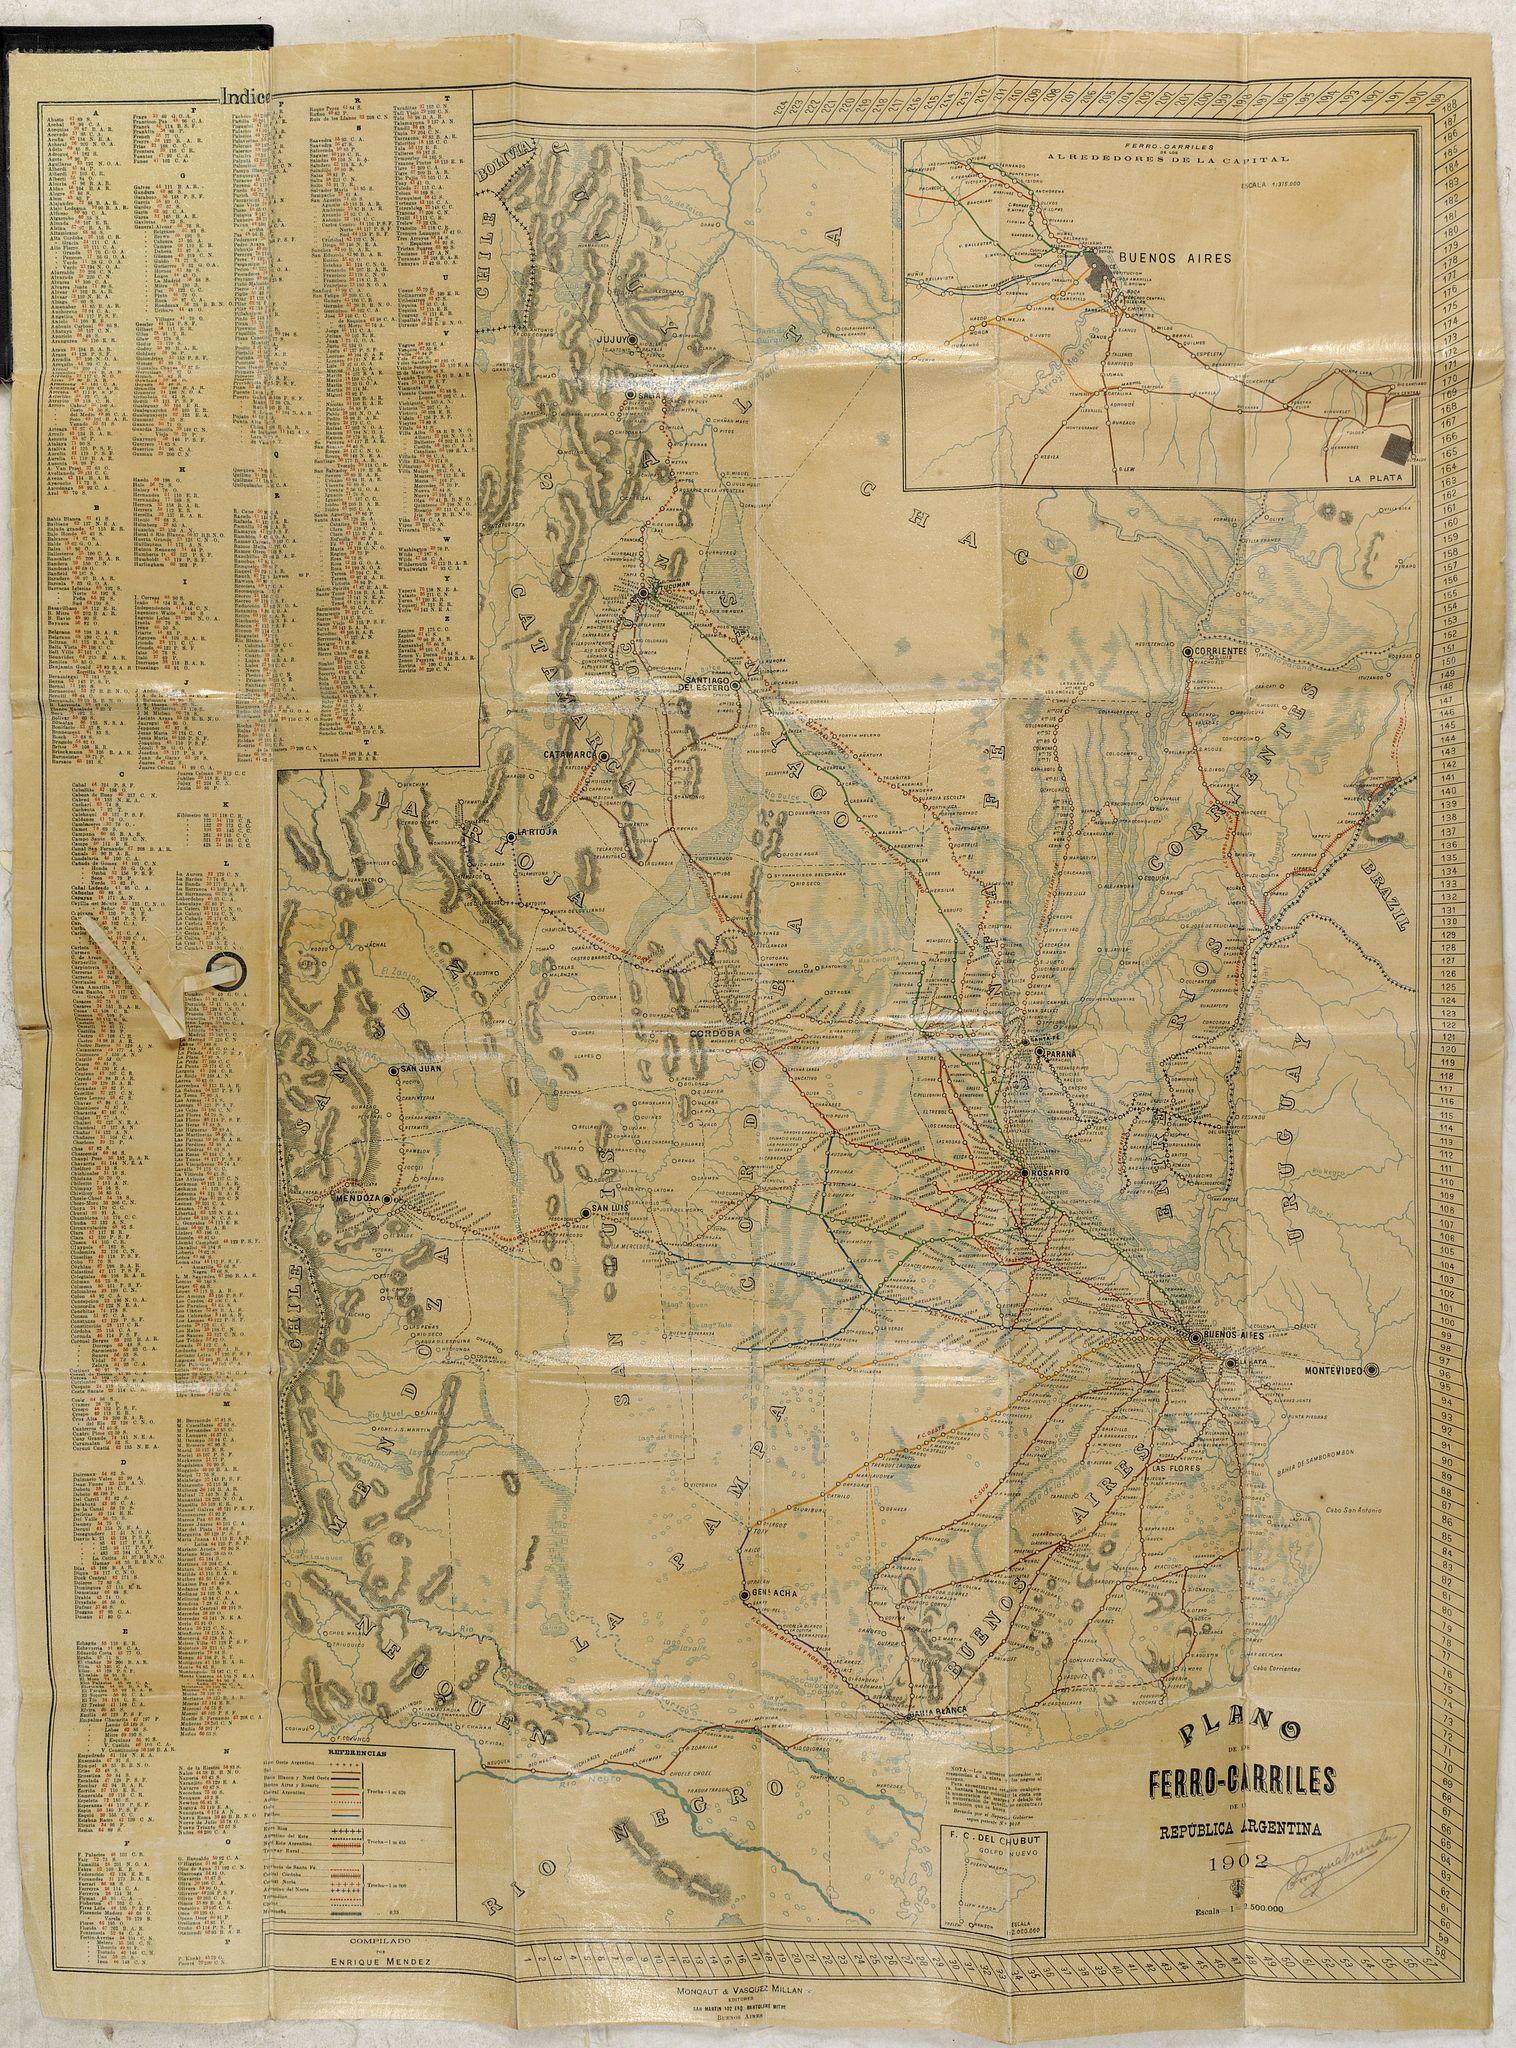 MONQAUT / VAZQUEZ MILLAN -  Plano de los Ferro-Carriles de Republica Argentina 1902.